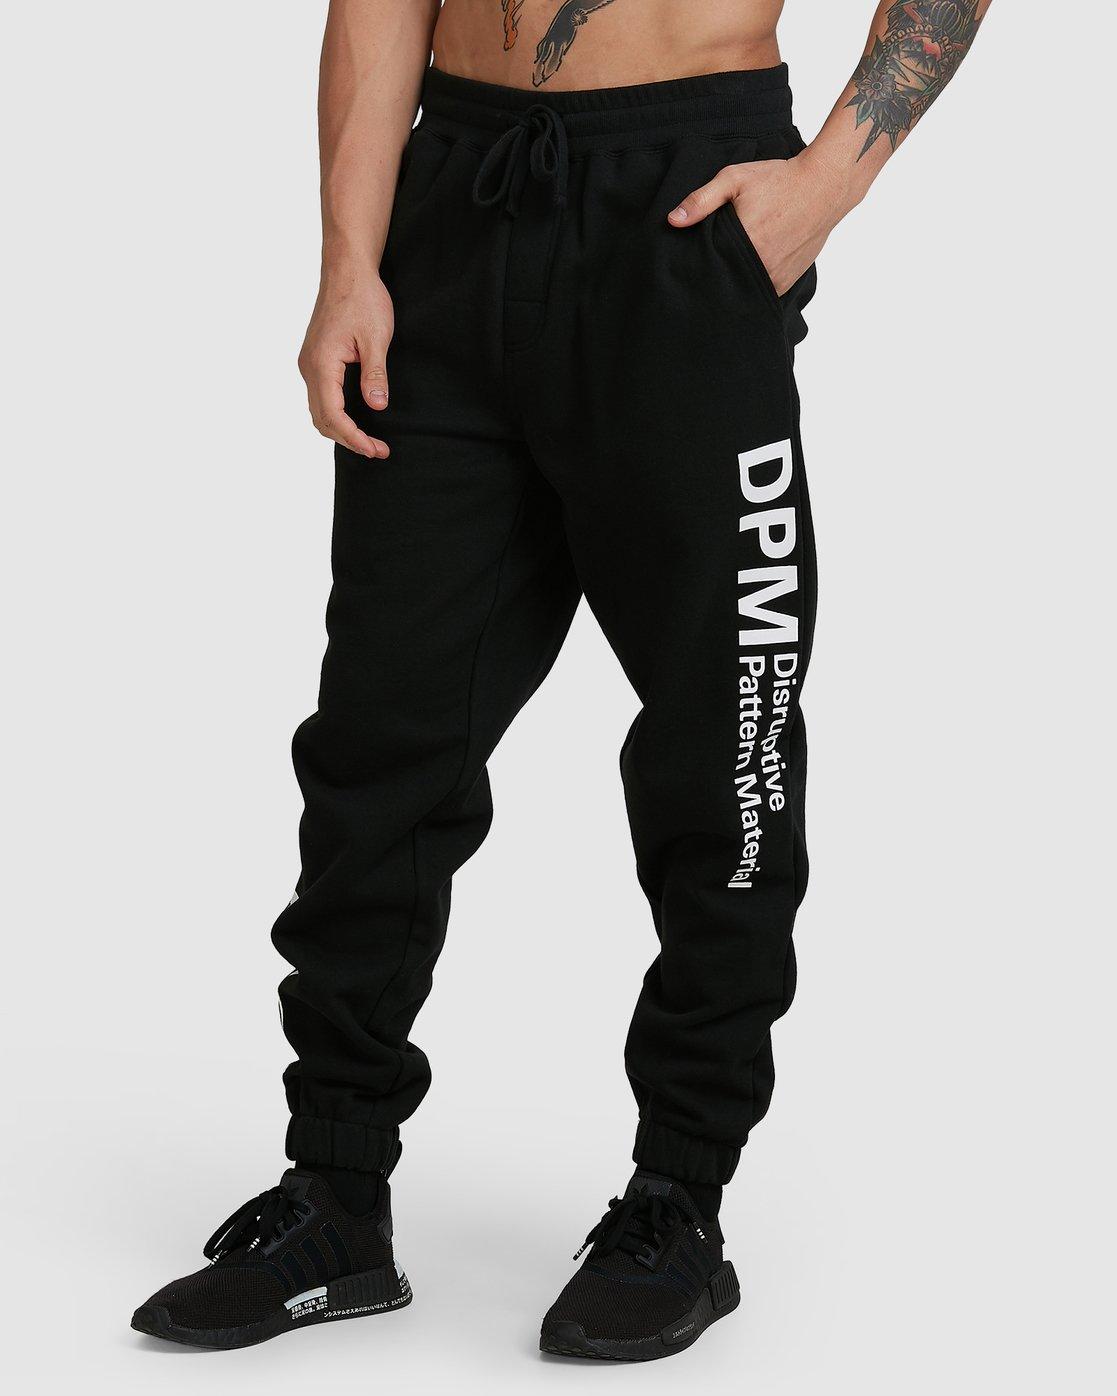 0 Dpm Fleece Pant Black R305284 RVCA